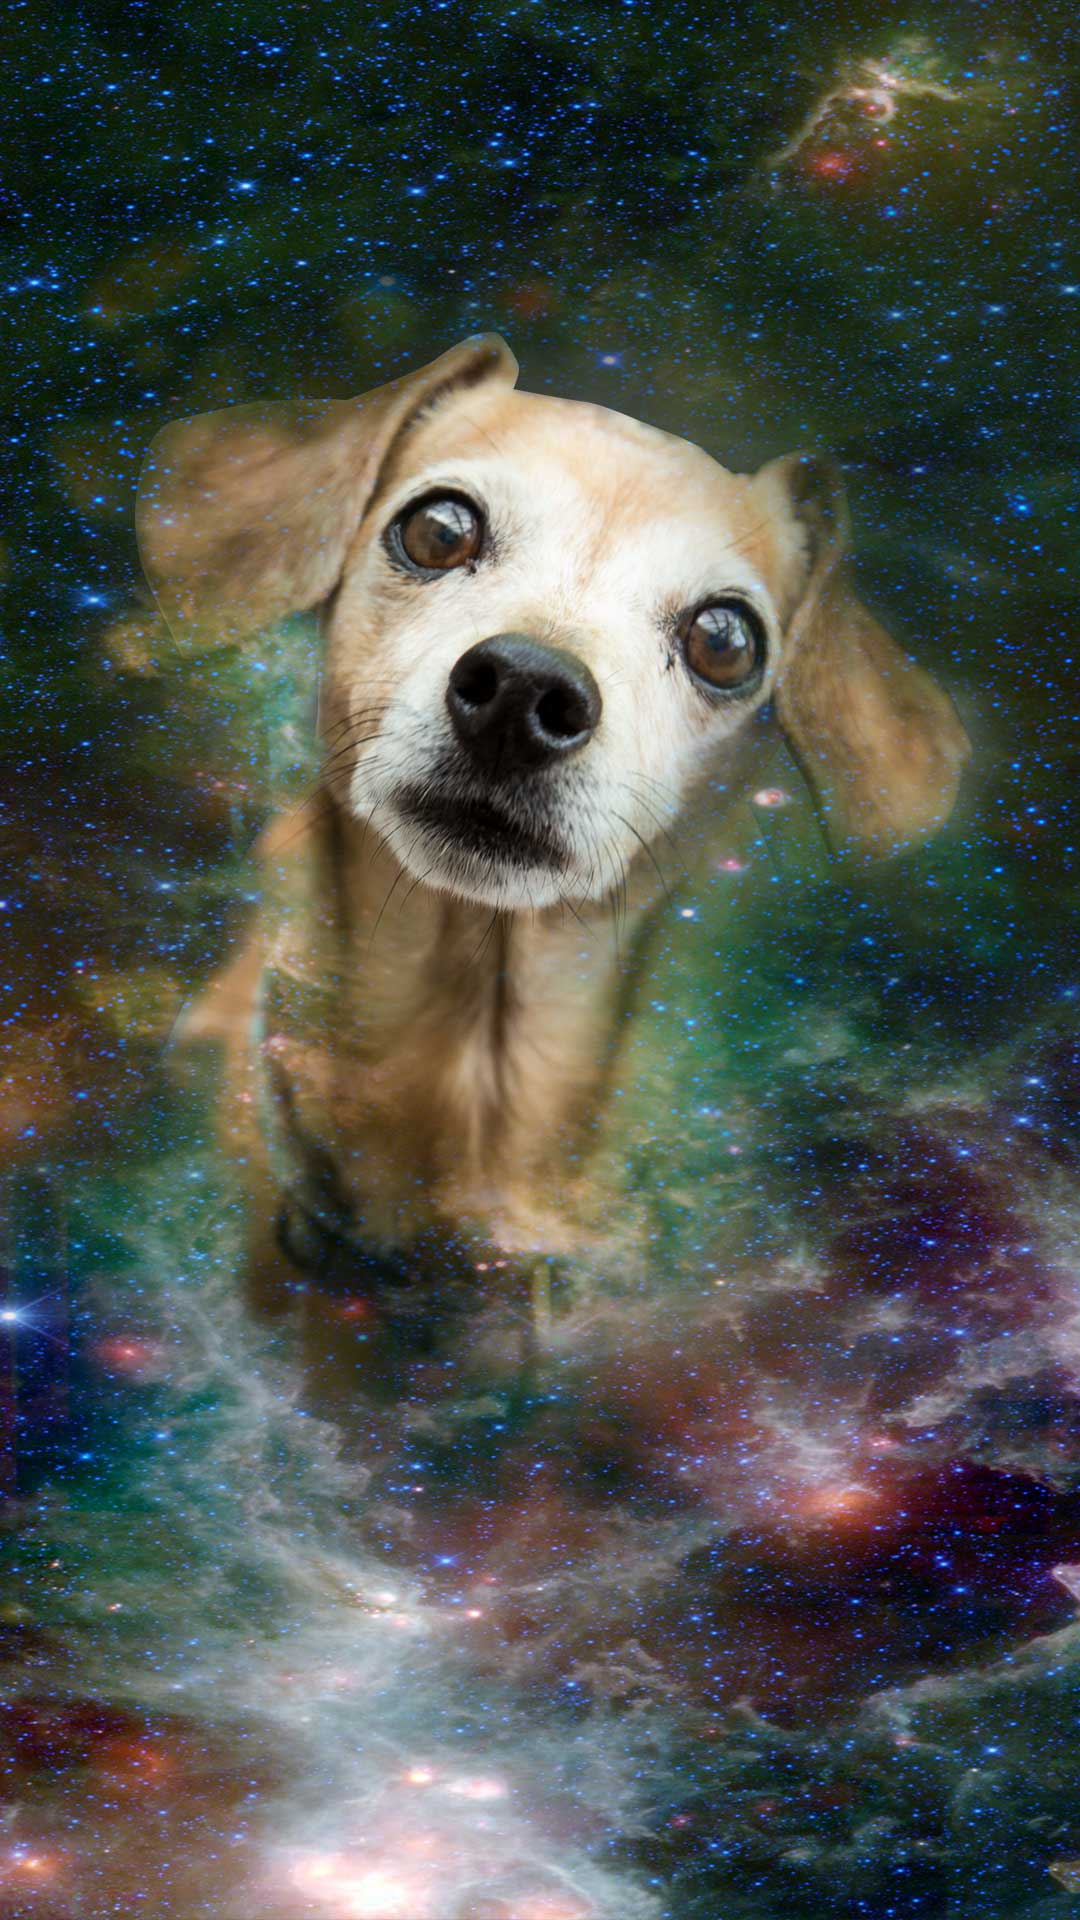 Iphone Wiener Dog Wallpaper Download Casella Creative